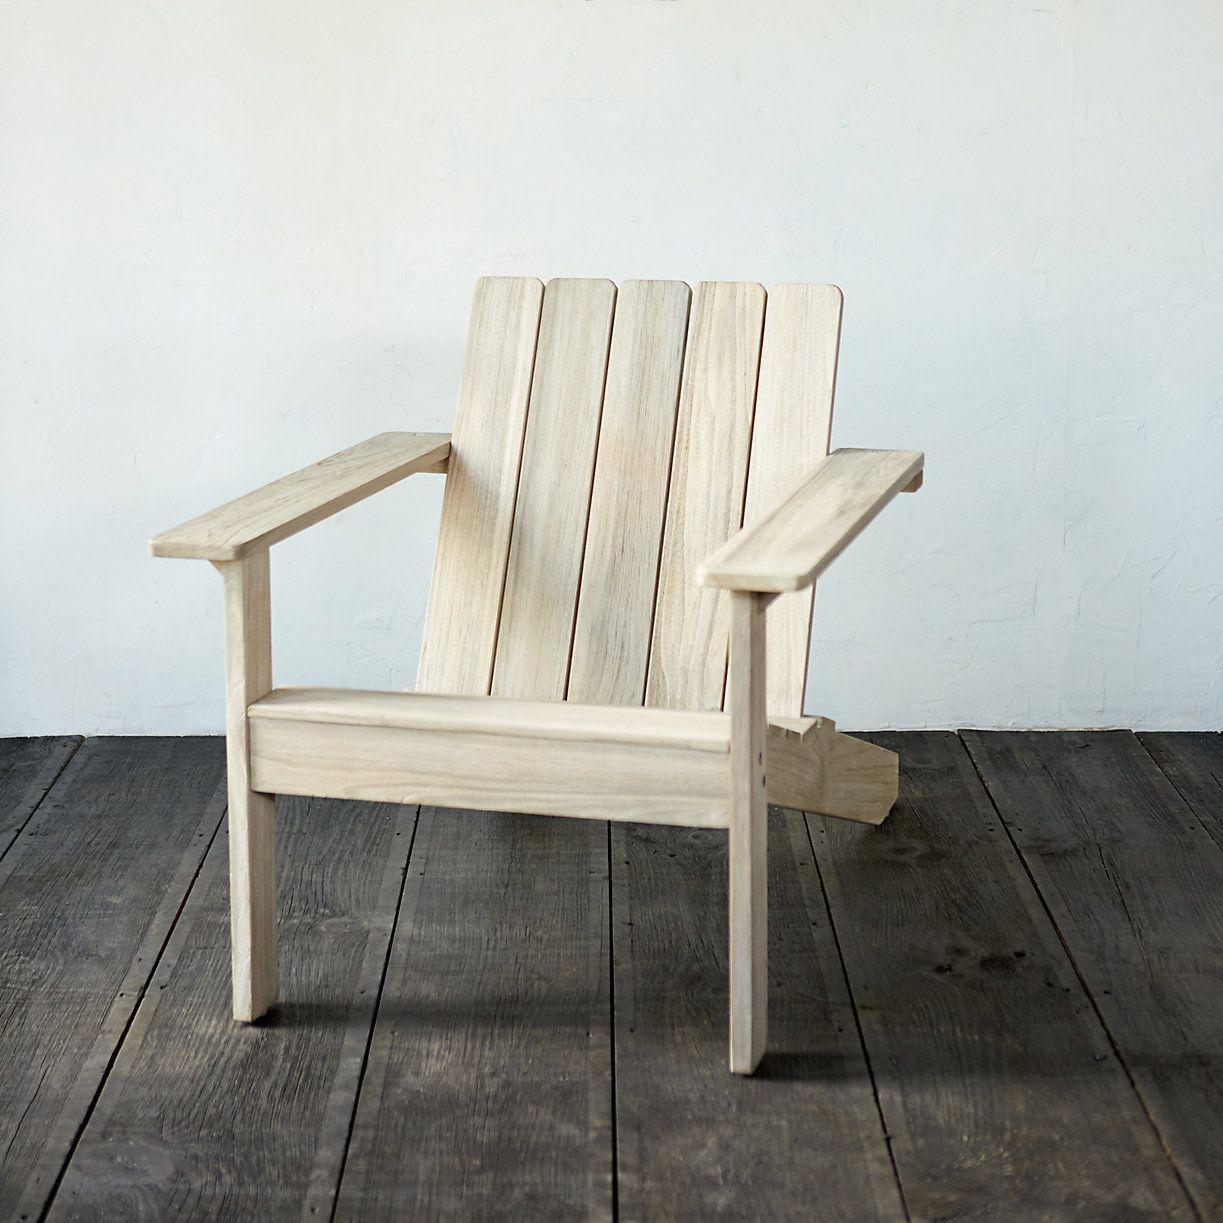 Teak Adirondack Chair With Images Teak Patio Furniture Garden